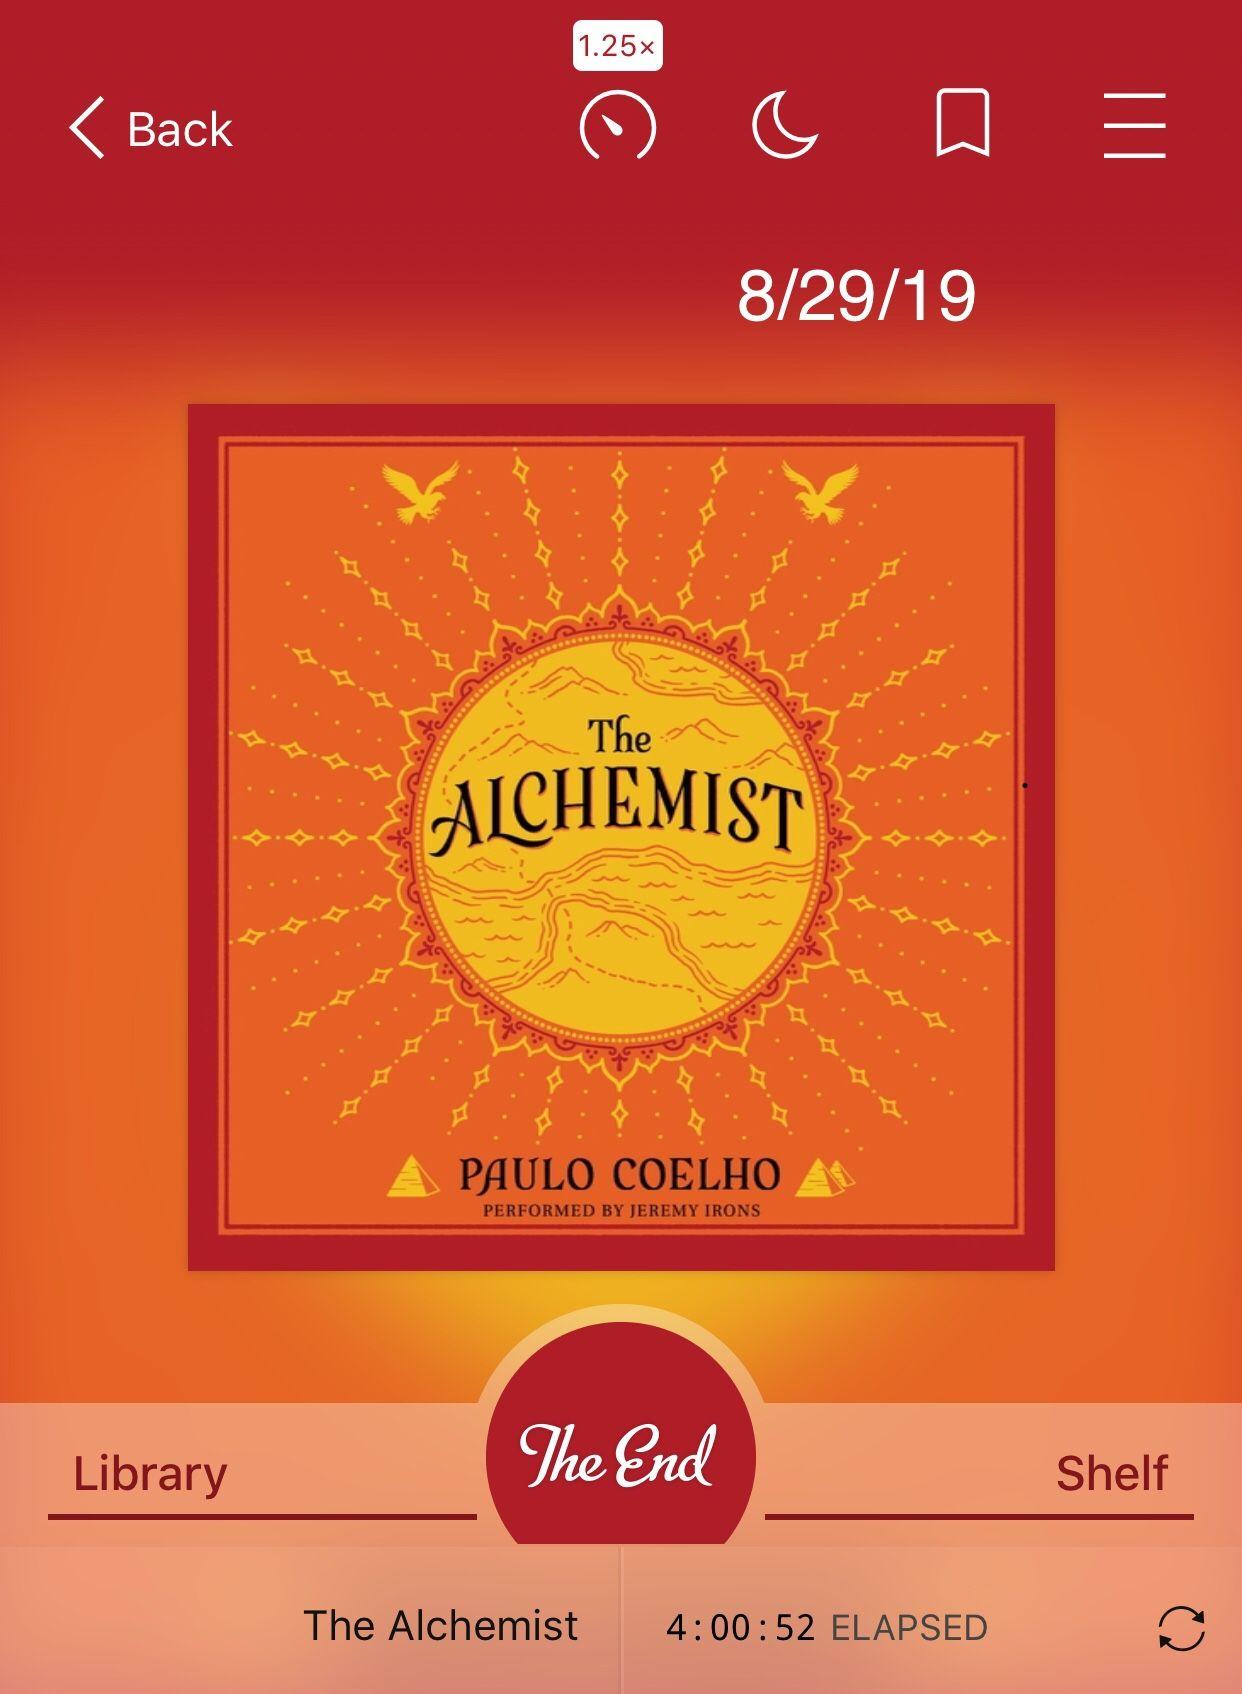 Pin by Jessica Landa on Books I've Read The alchemist